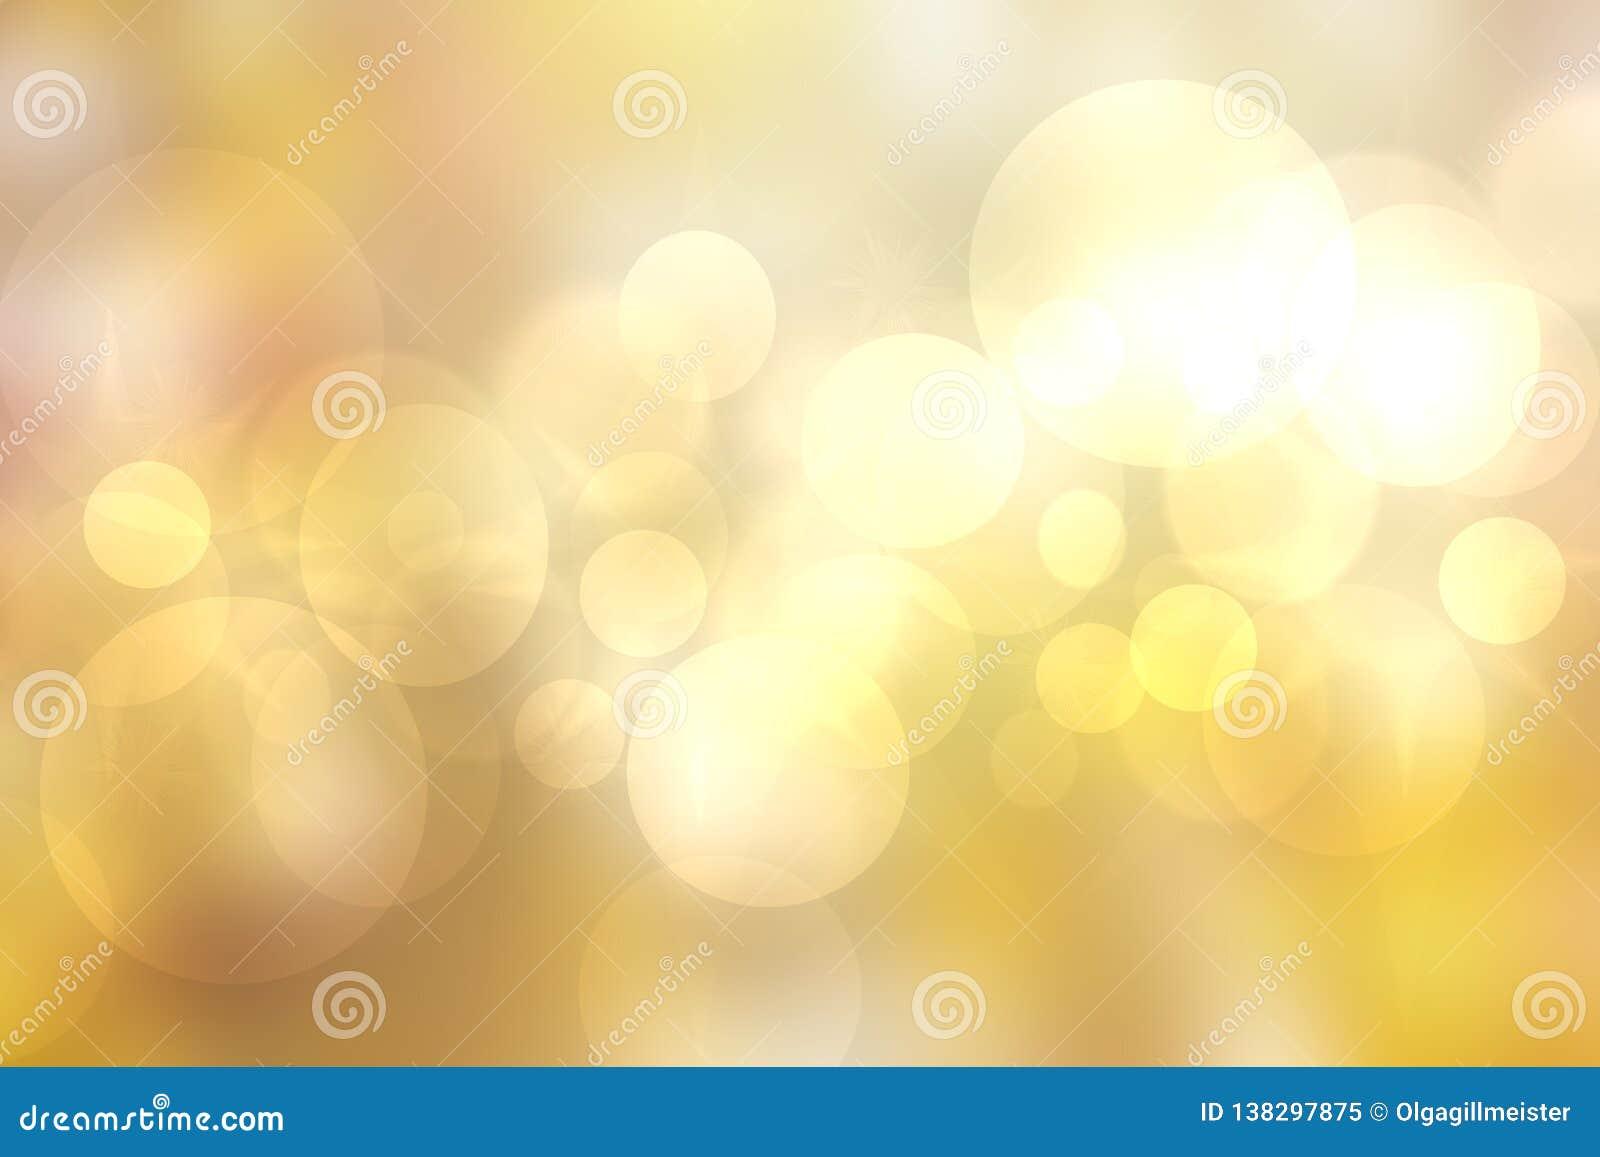 Abstrakt gul ljus texturbokehbakgrund med guld- glans